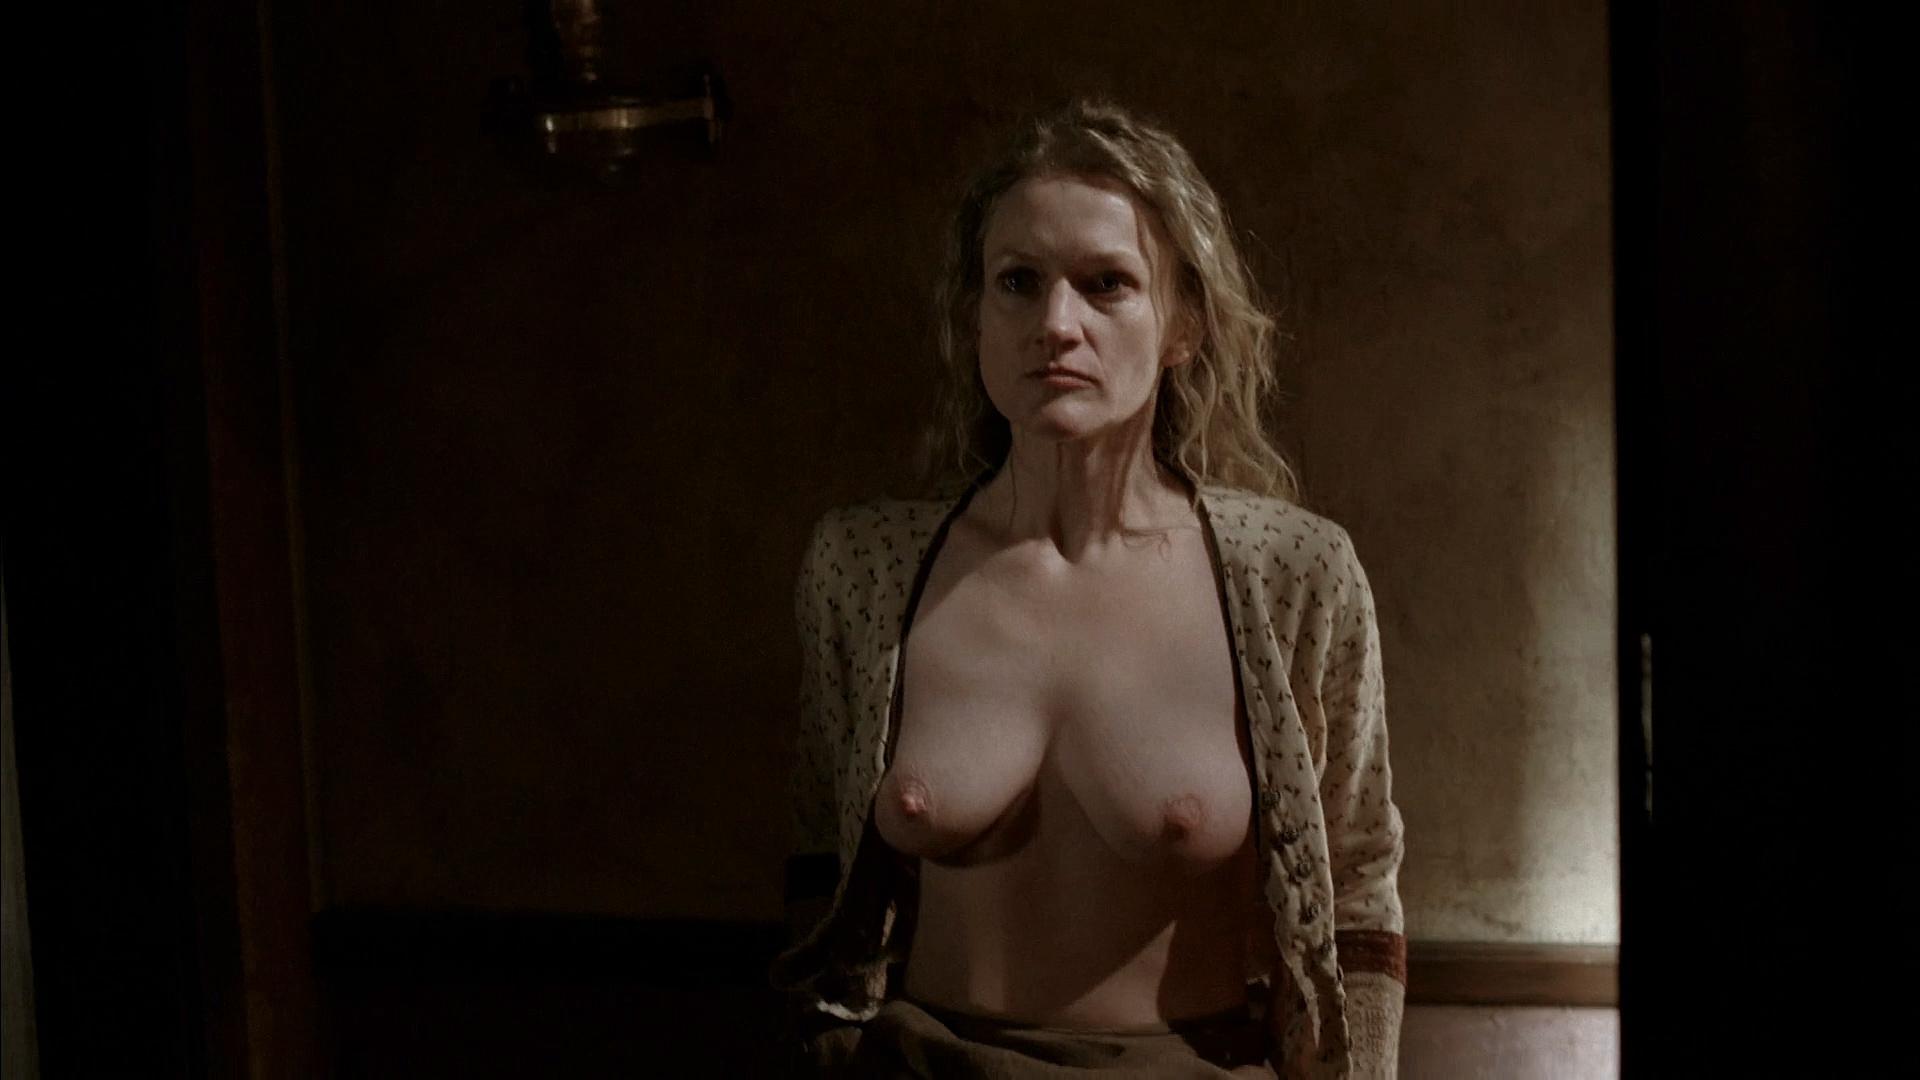 Rachel Ticotin Nude Pics Pics, Sex Tape Ancensored